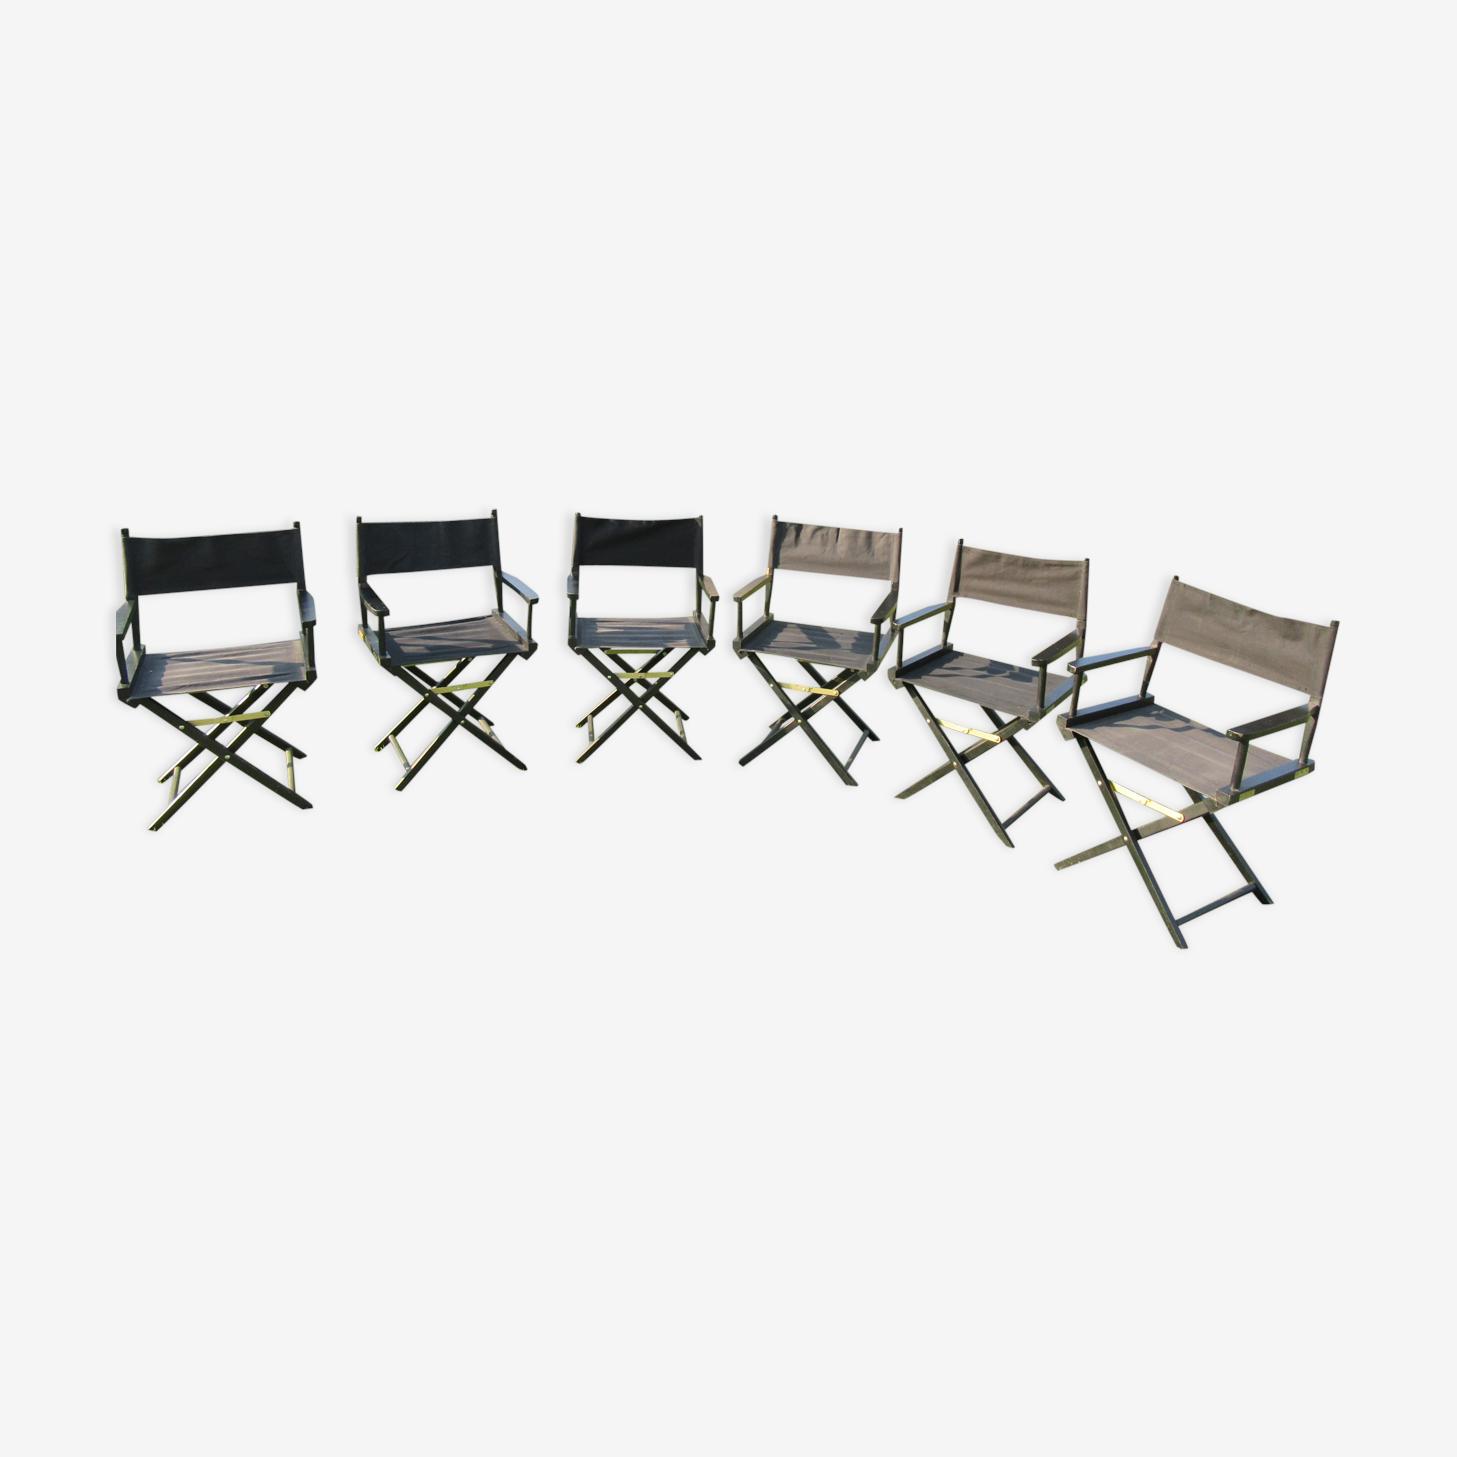 6 fauteuils de metteur en scène